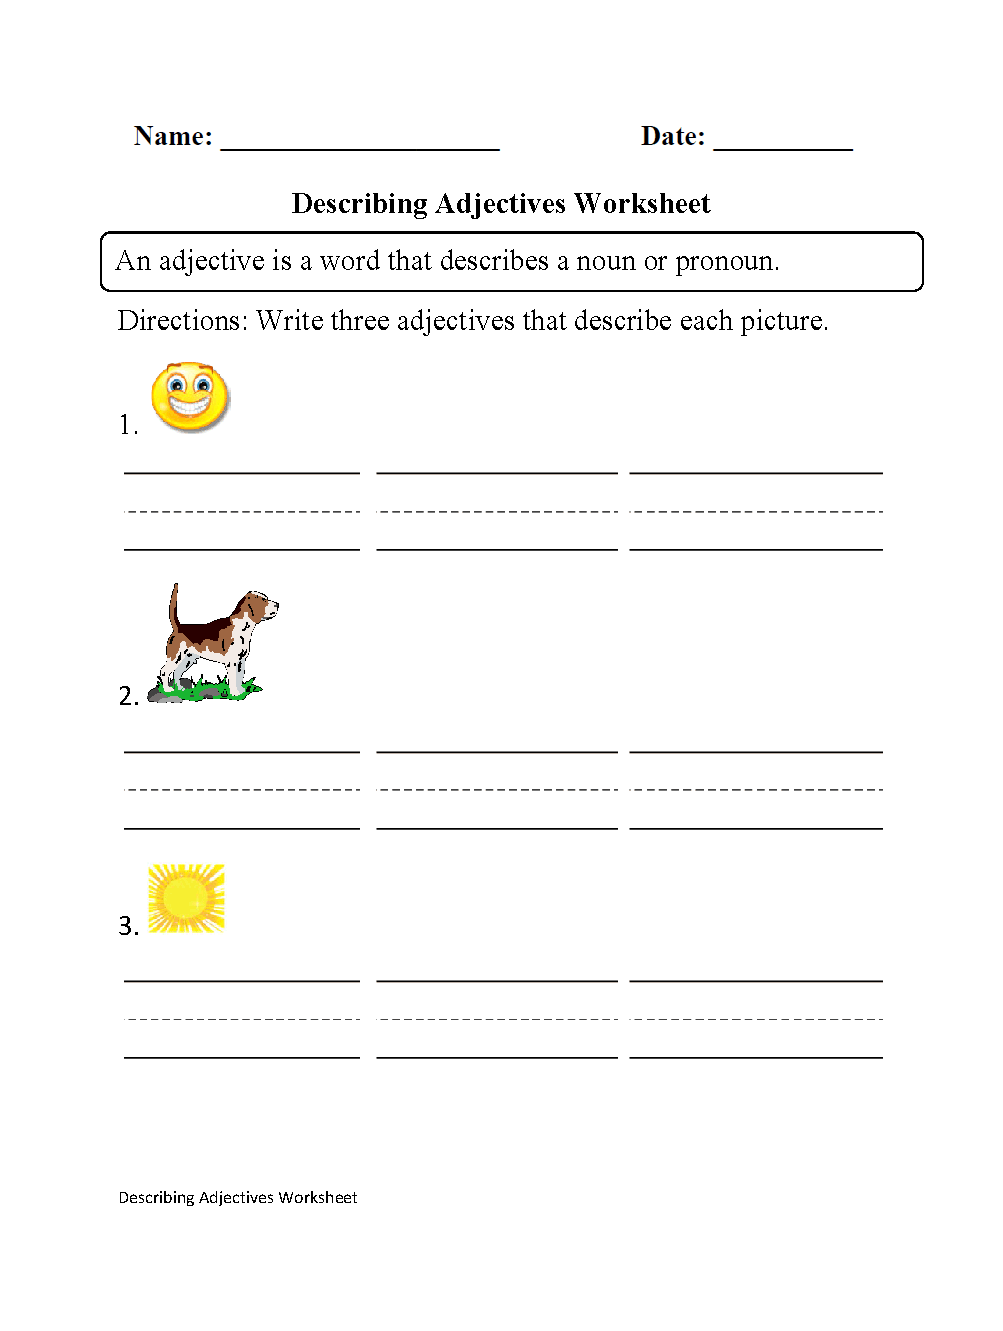 Workbooks nouns verbs adjectives worksheets : Adjectives Worksheets | Regular Adjectives Worksheets